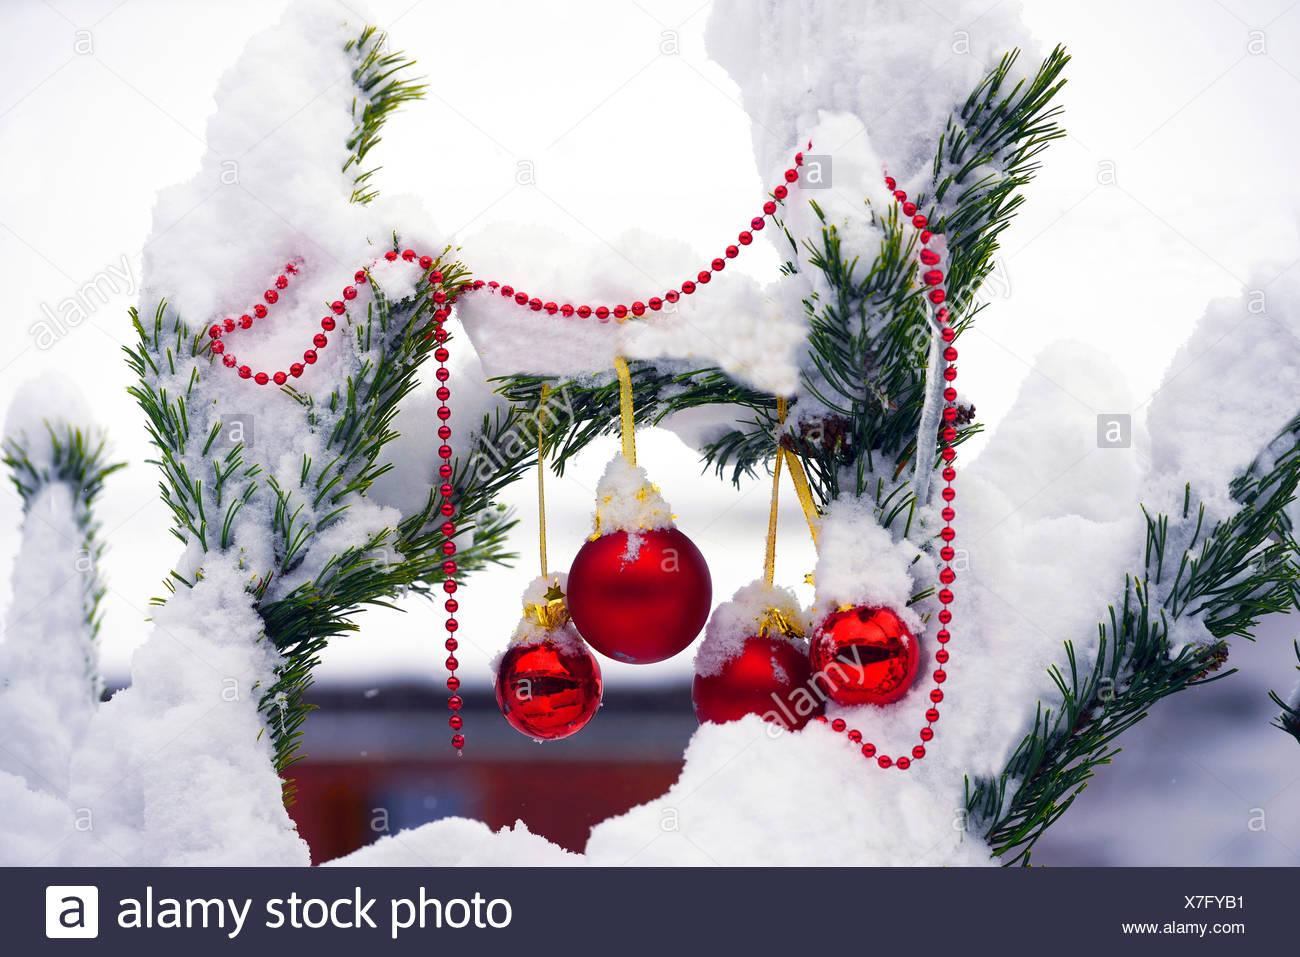 Christbaumkugeln At.Christbaumkugeln An Verschneiten Tannenzweigen Frankreich